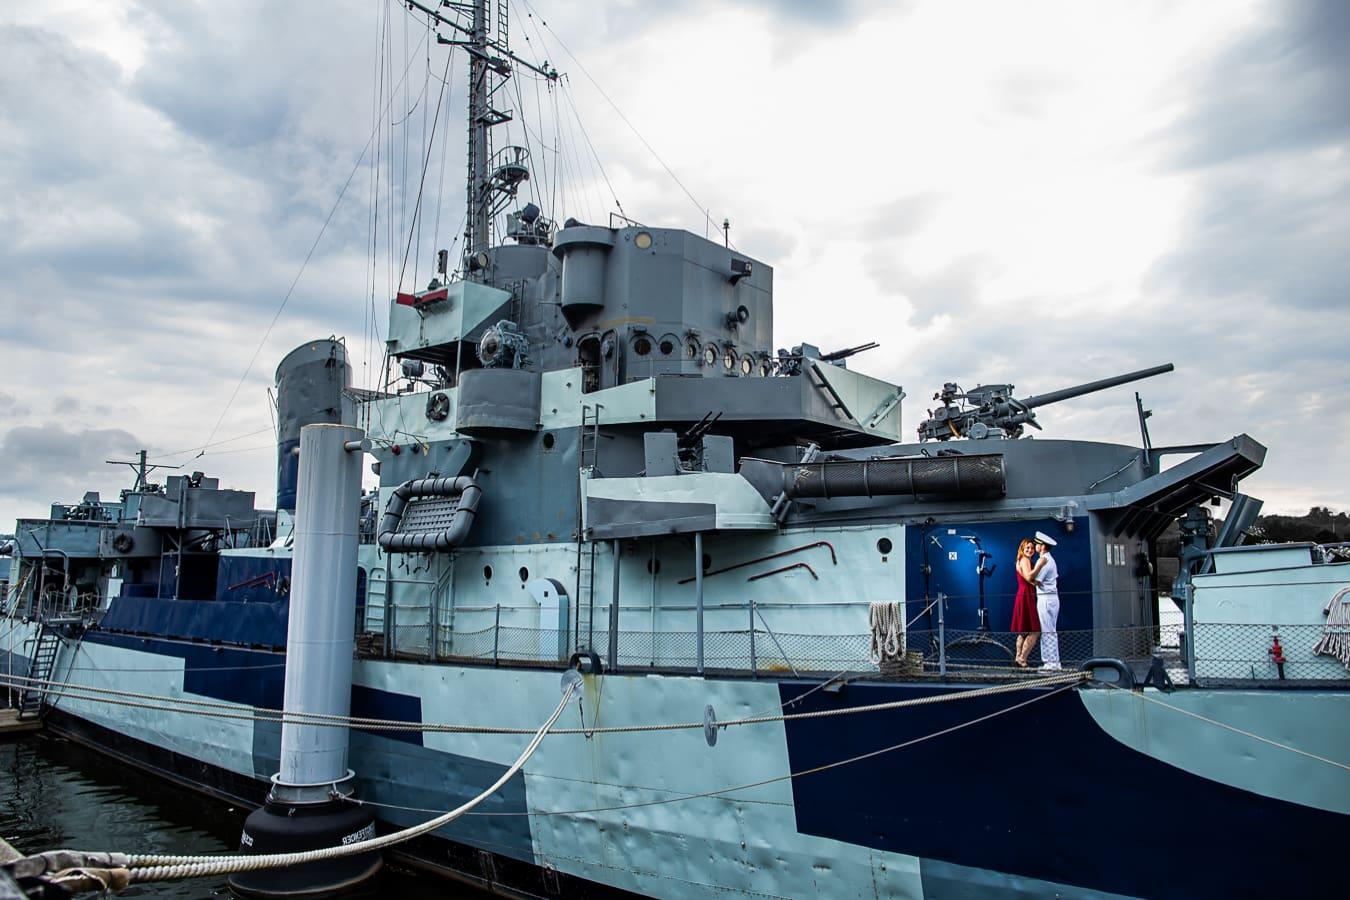 Battleship Engagement Session – Destination Engagement Photographer